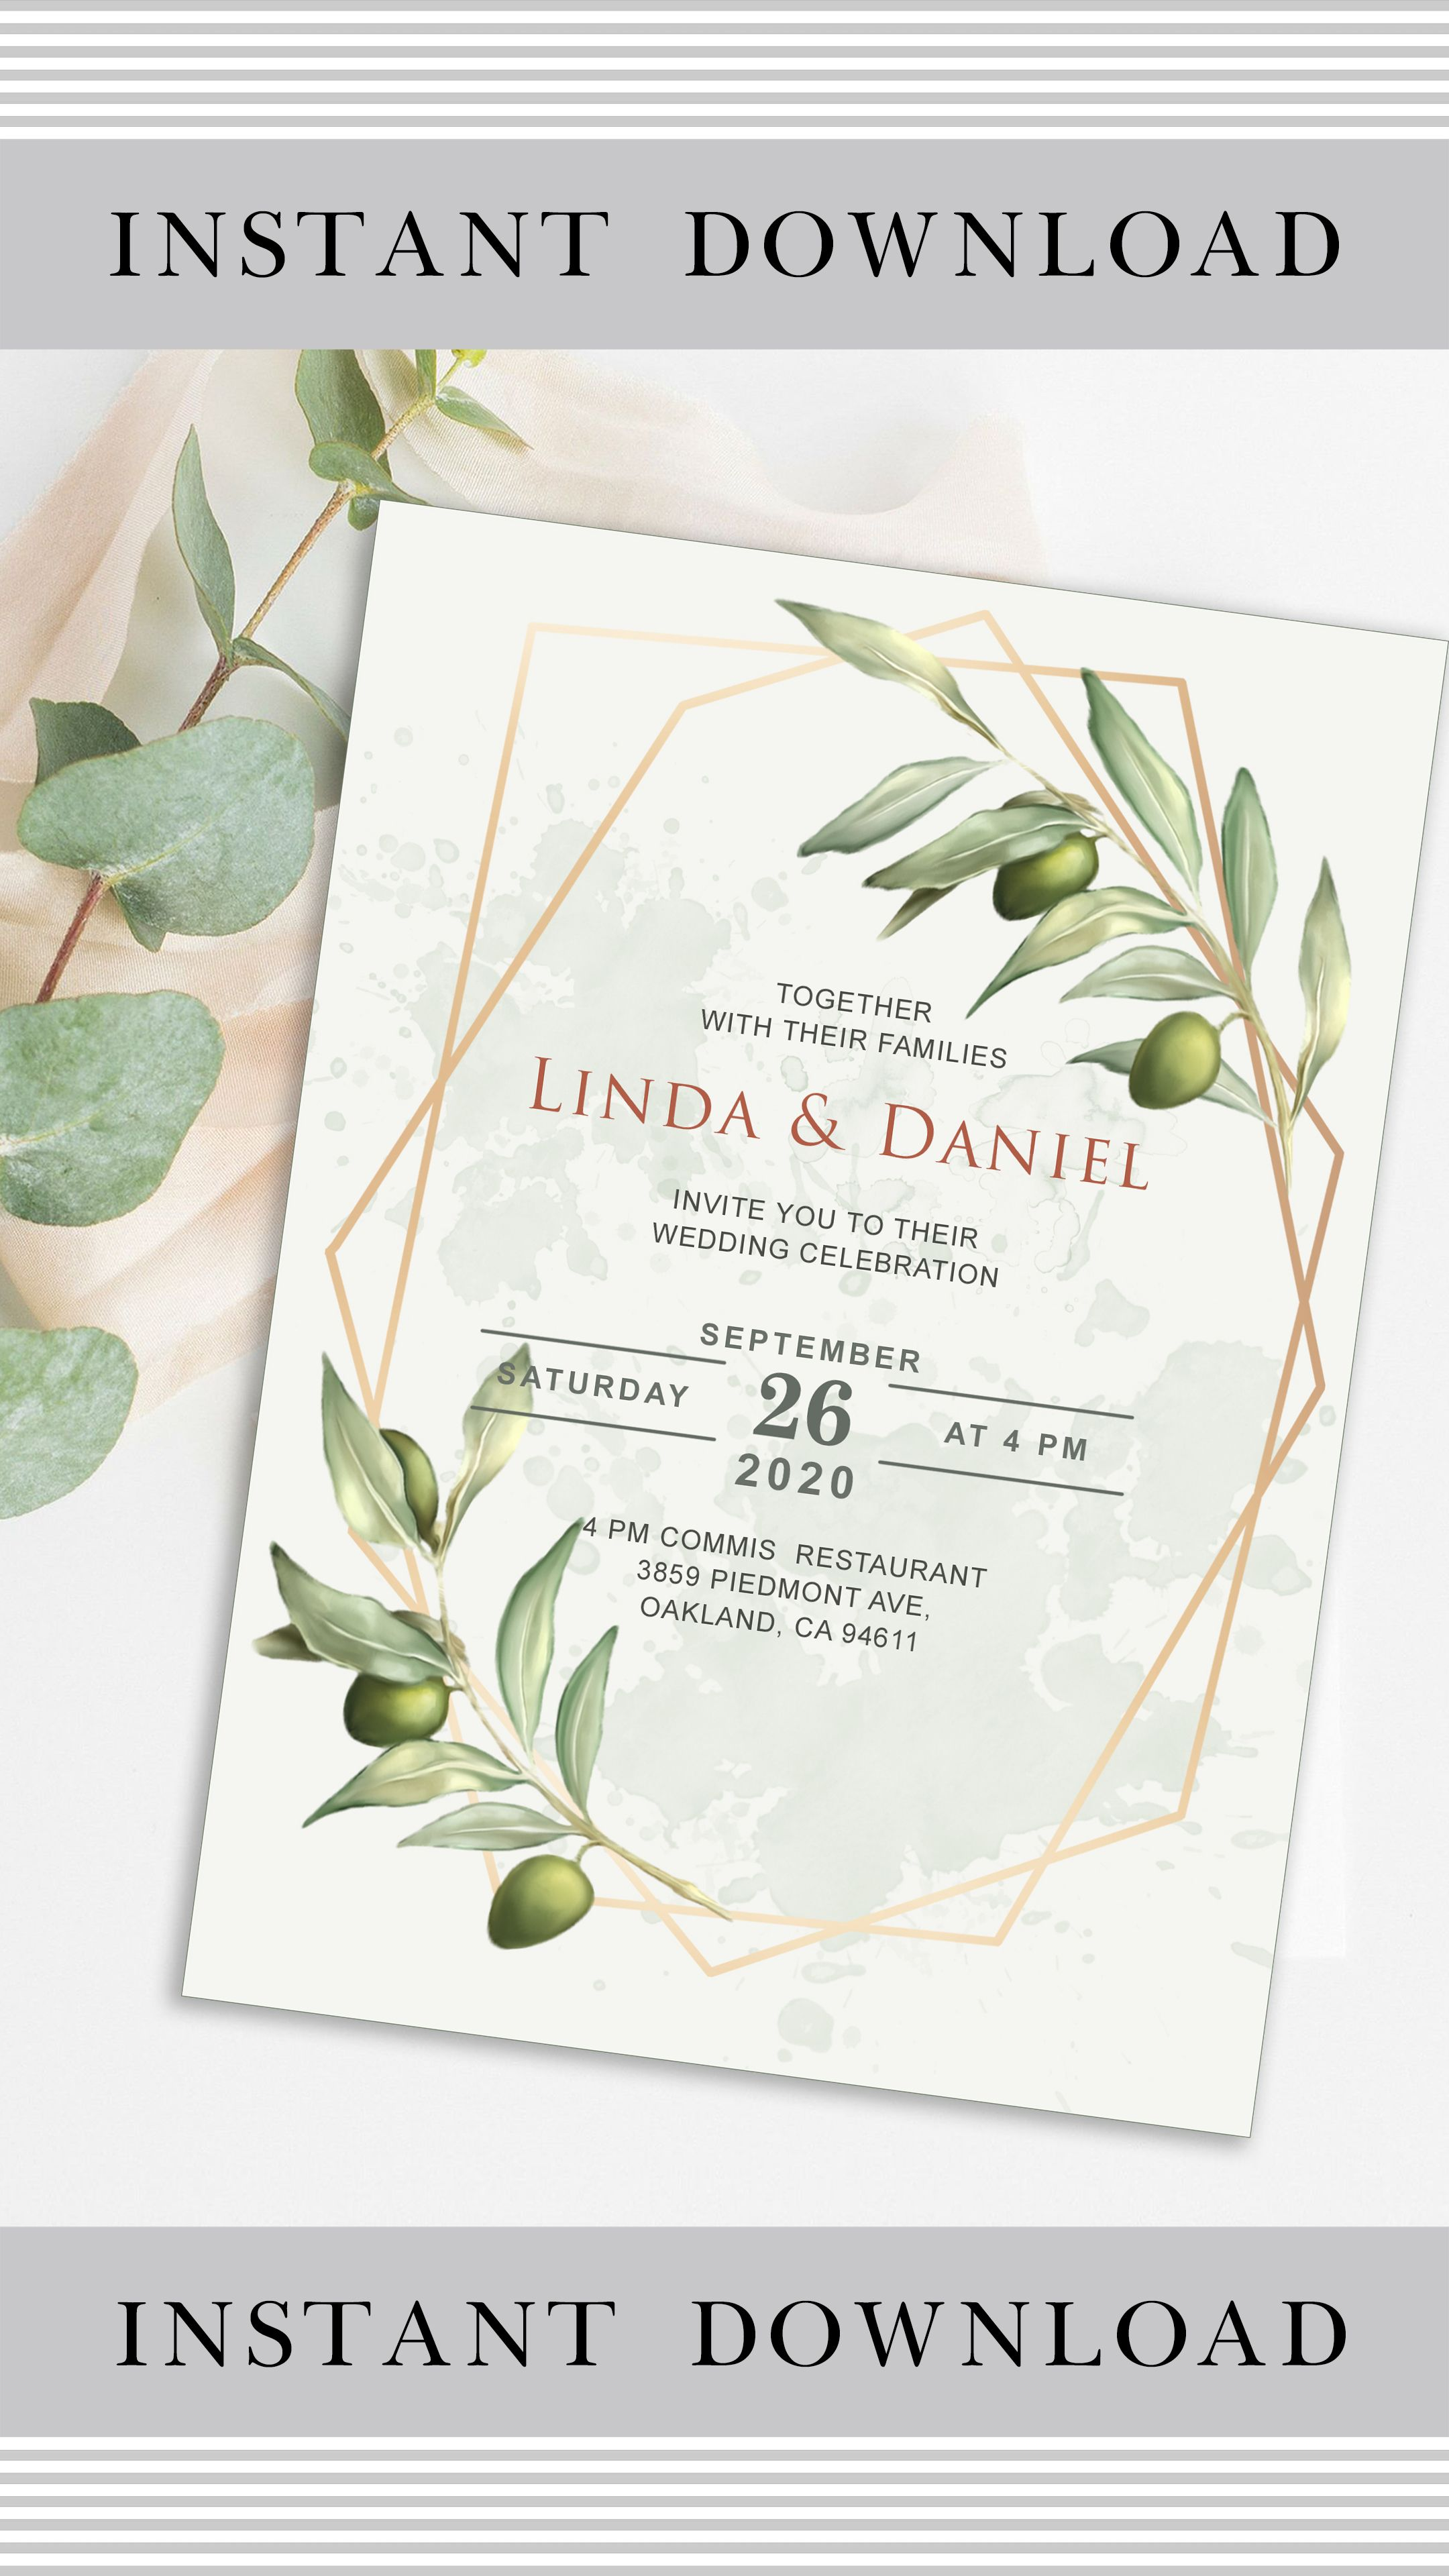 Floral Wedding Invitation Template Geometric Wedding Invitation Botanical Wedding Inv In 2021 Wedding Invitations Wedding Invitations Rustic Wedding Invitation Cards